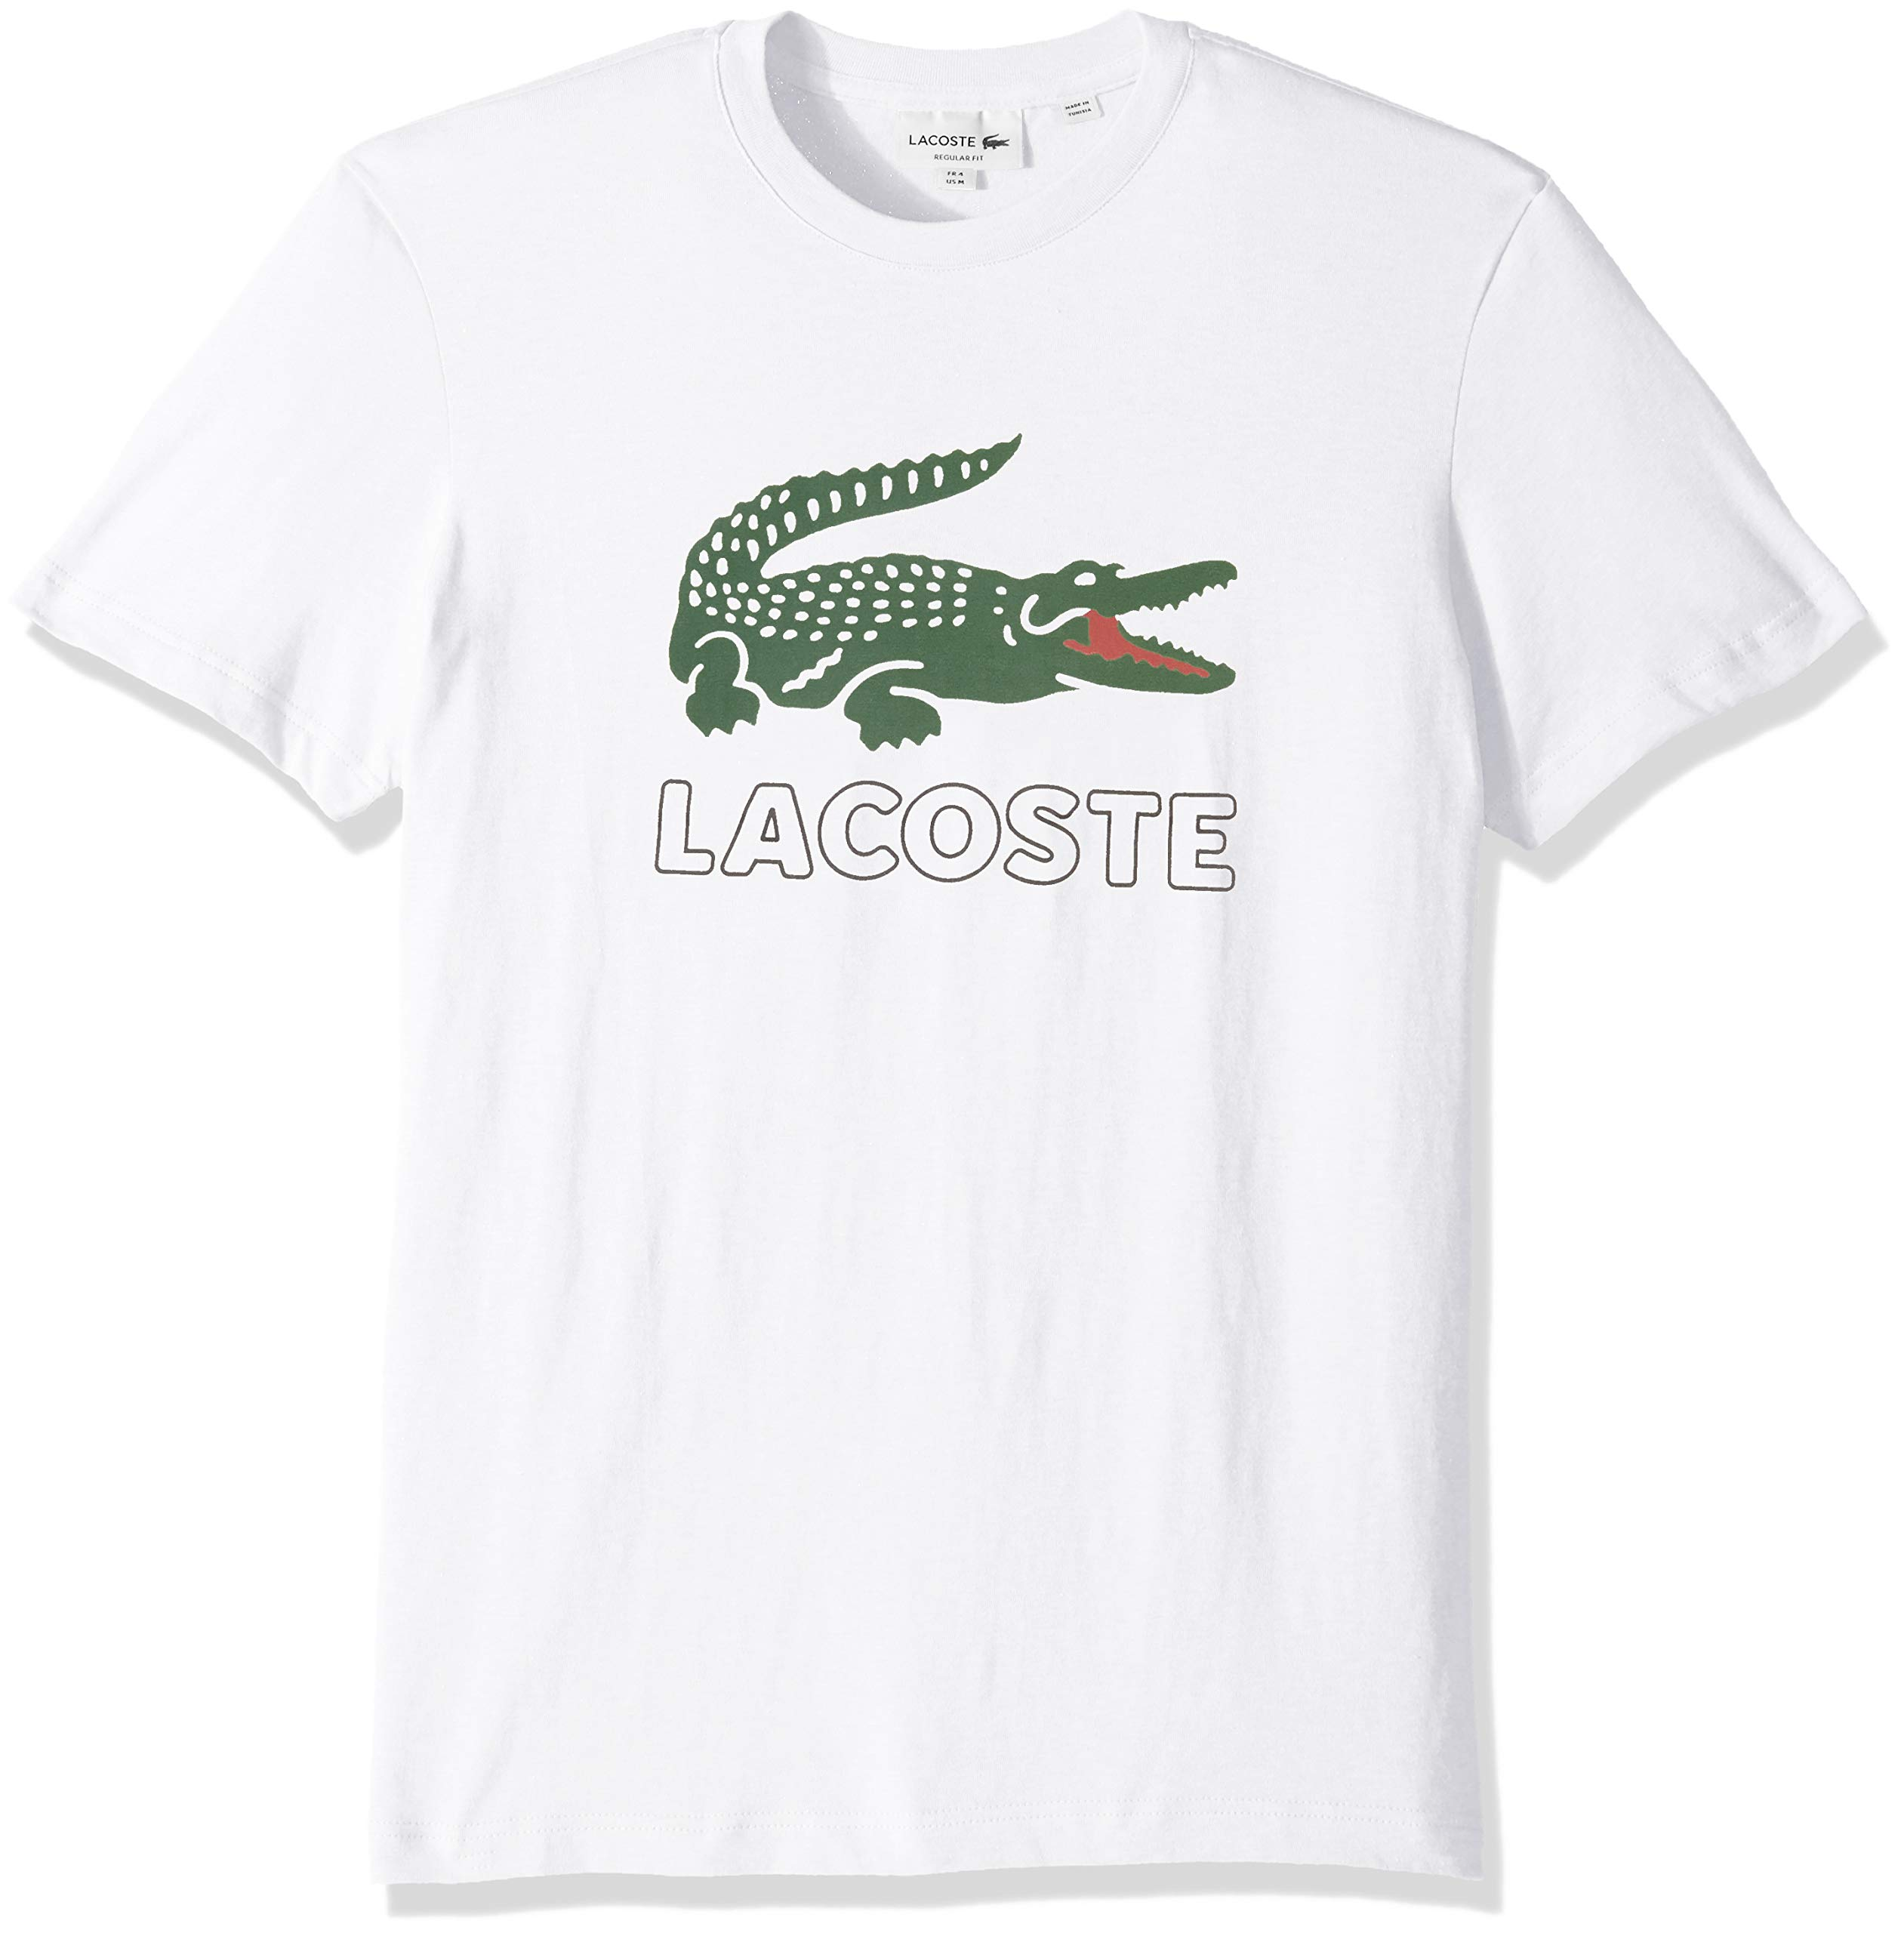 Lacoste Men's S/S Graphic Jersey Croc Regular FIT T-Shirt, White, X-Large